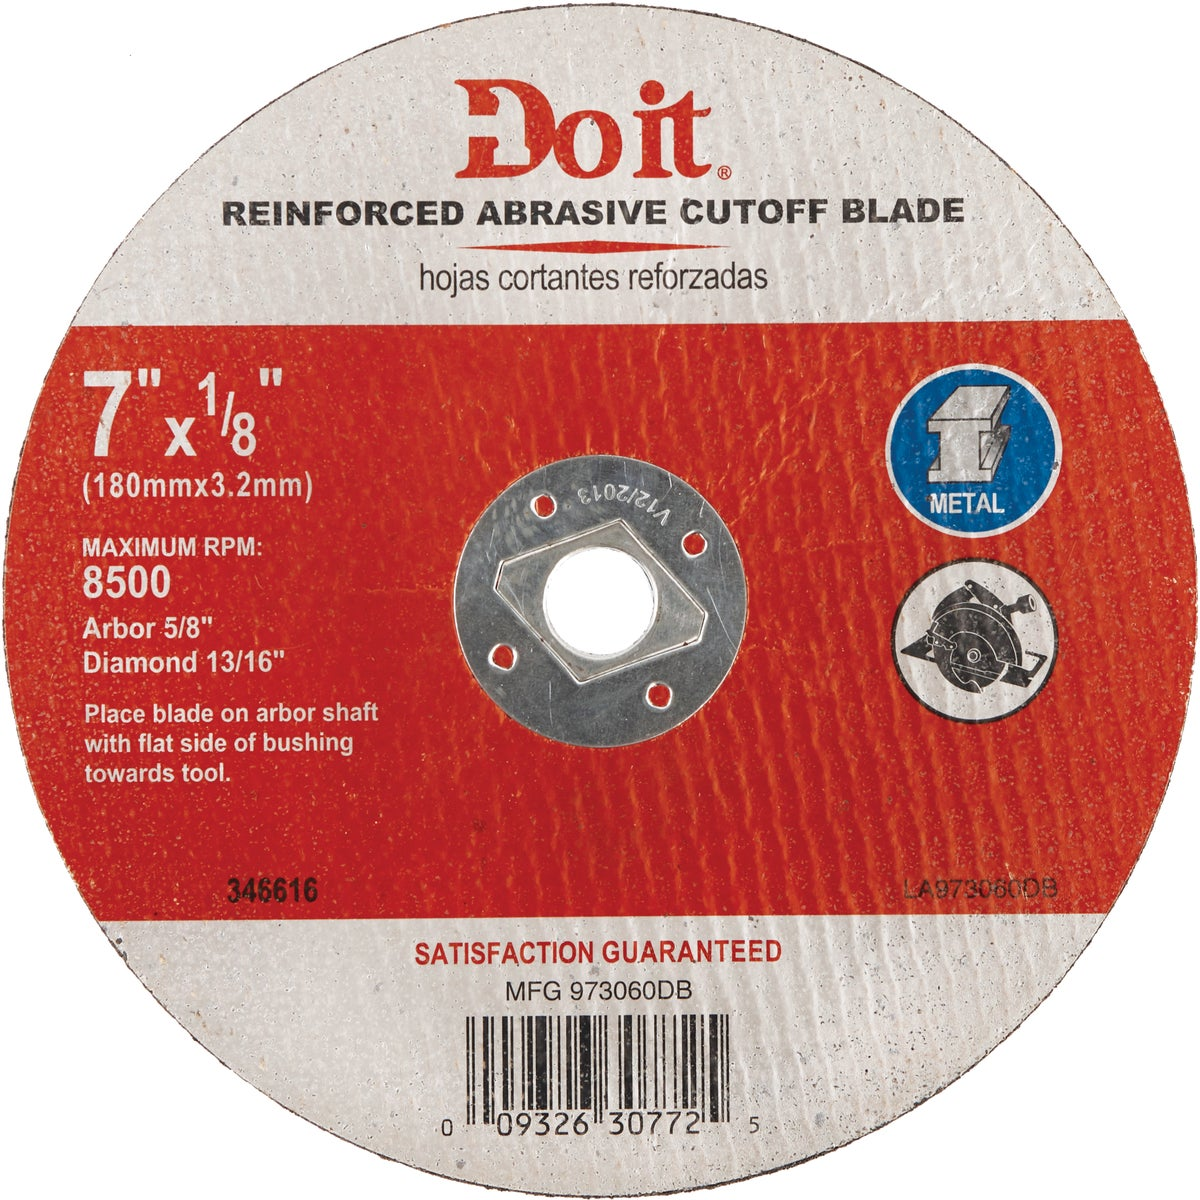 Mibro/GS Do it Best Metal Cutting Abrasive Cut-Off Blade at Sears.com